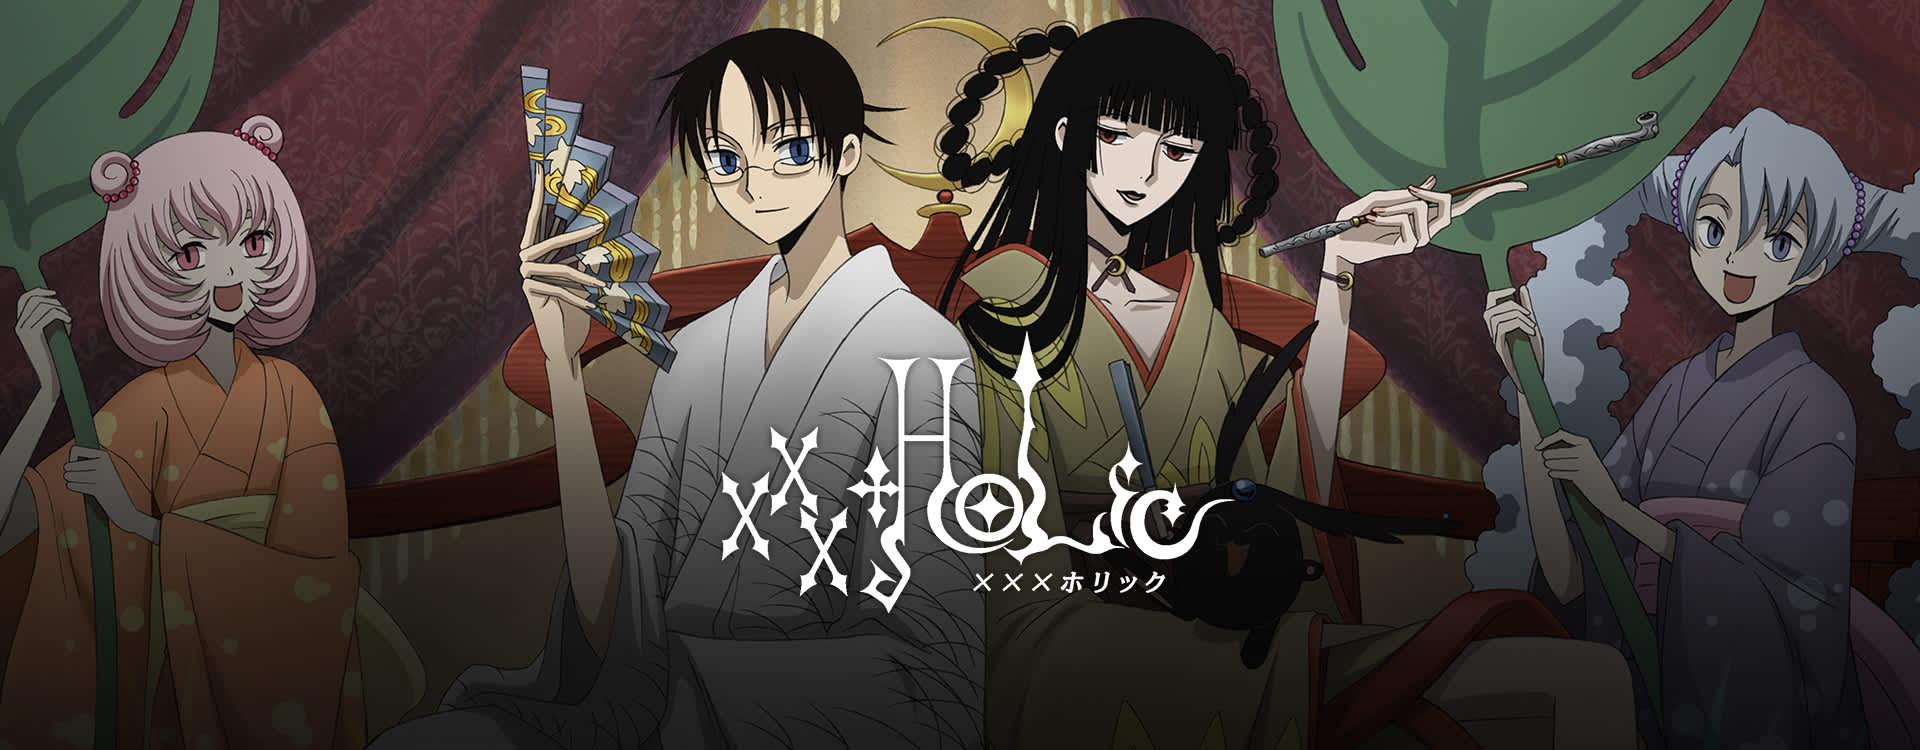 Full Anime Porn Movie Dubbed watch xxxholic episodes sub & dub | drama, fantasy anime